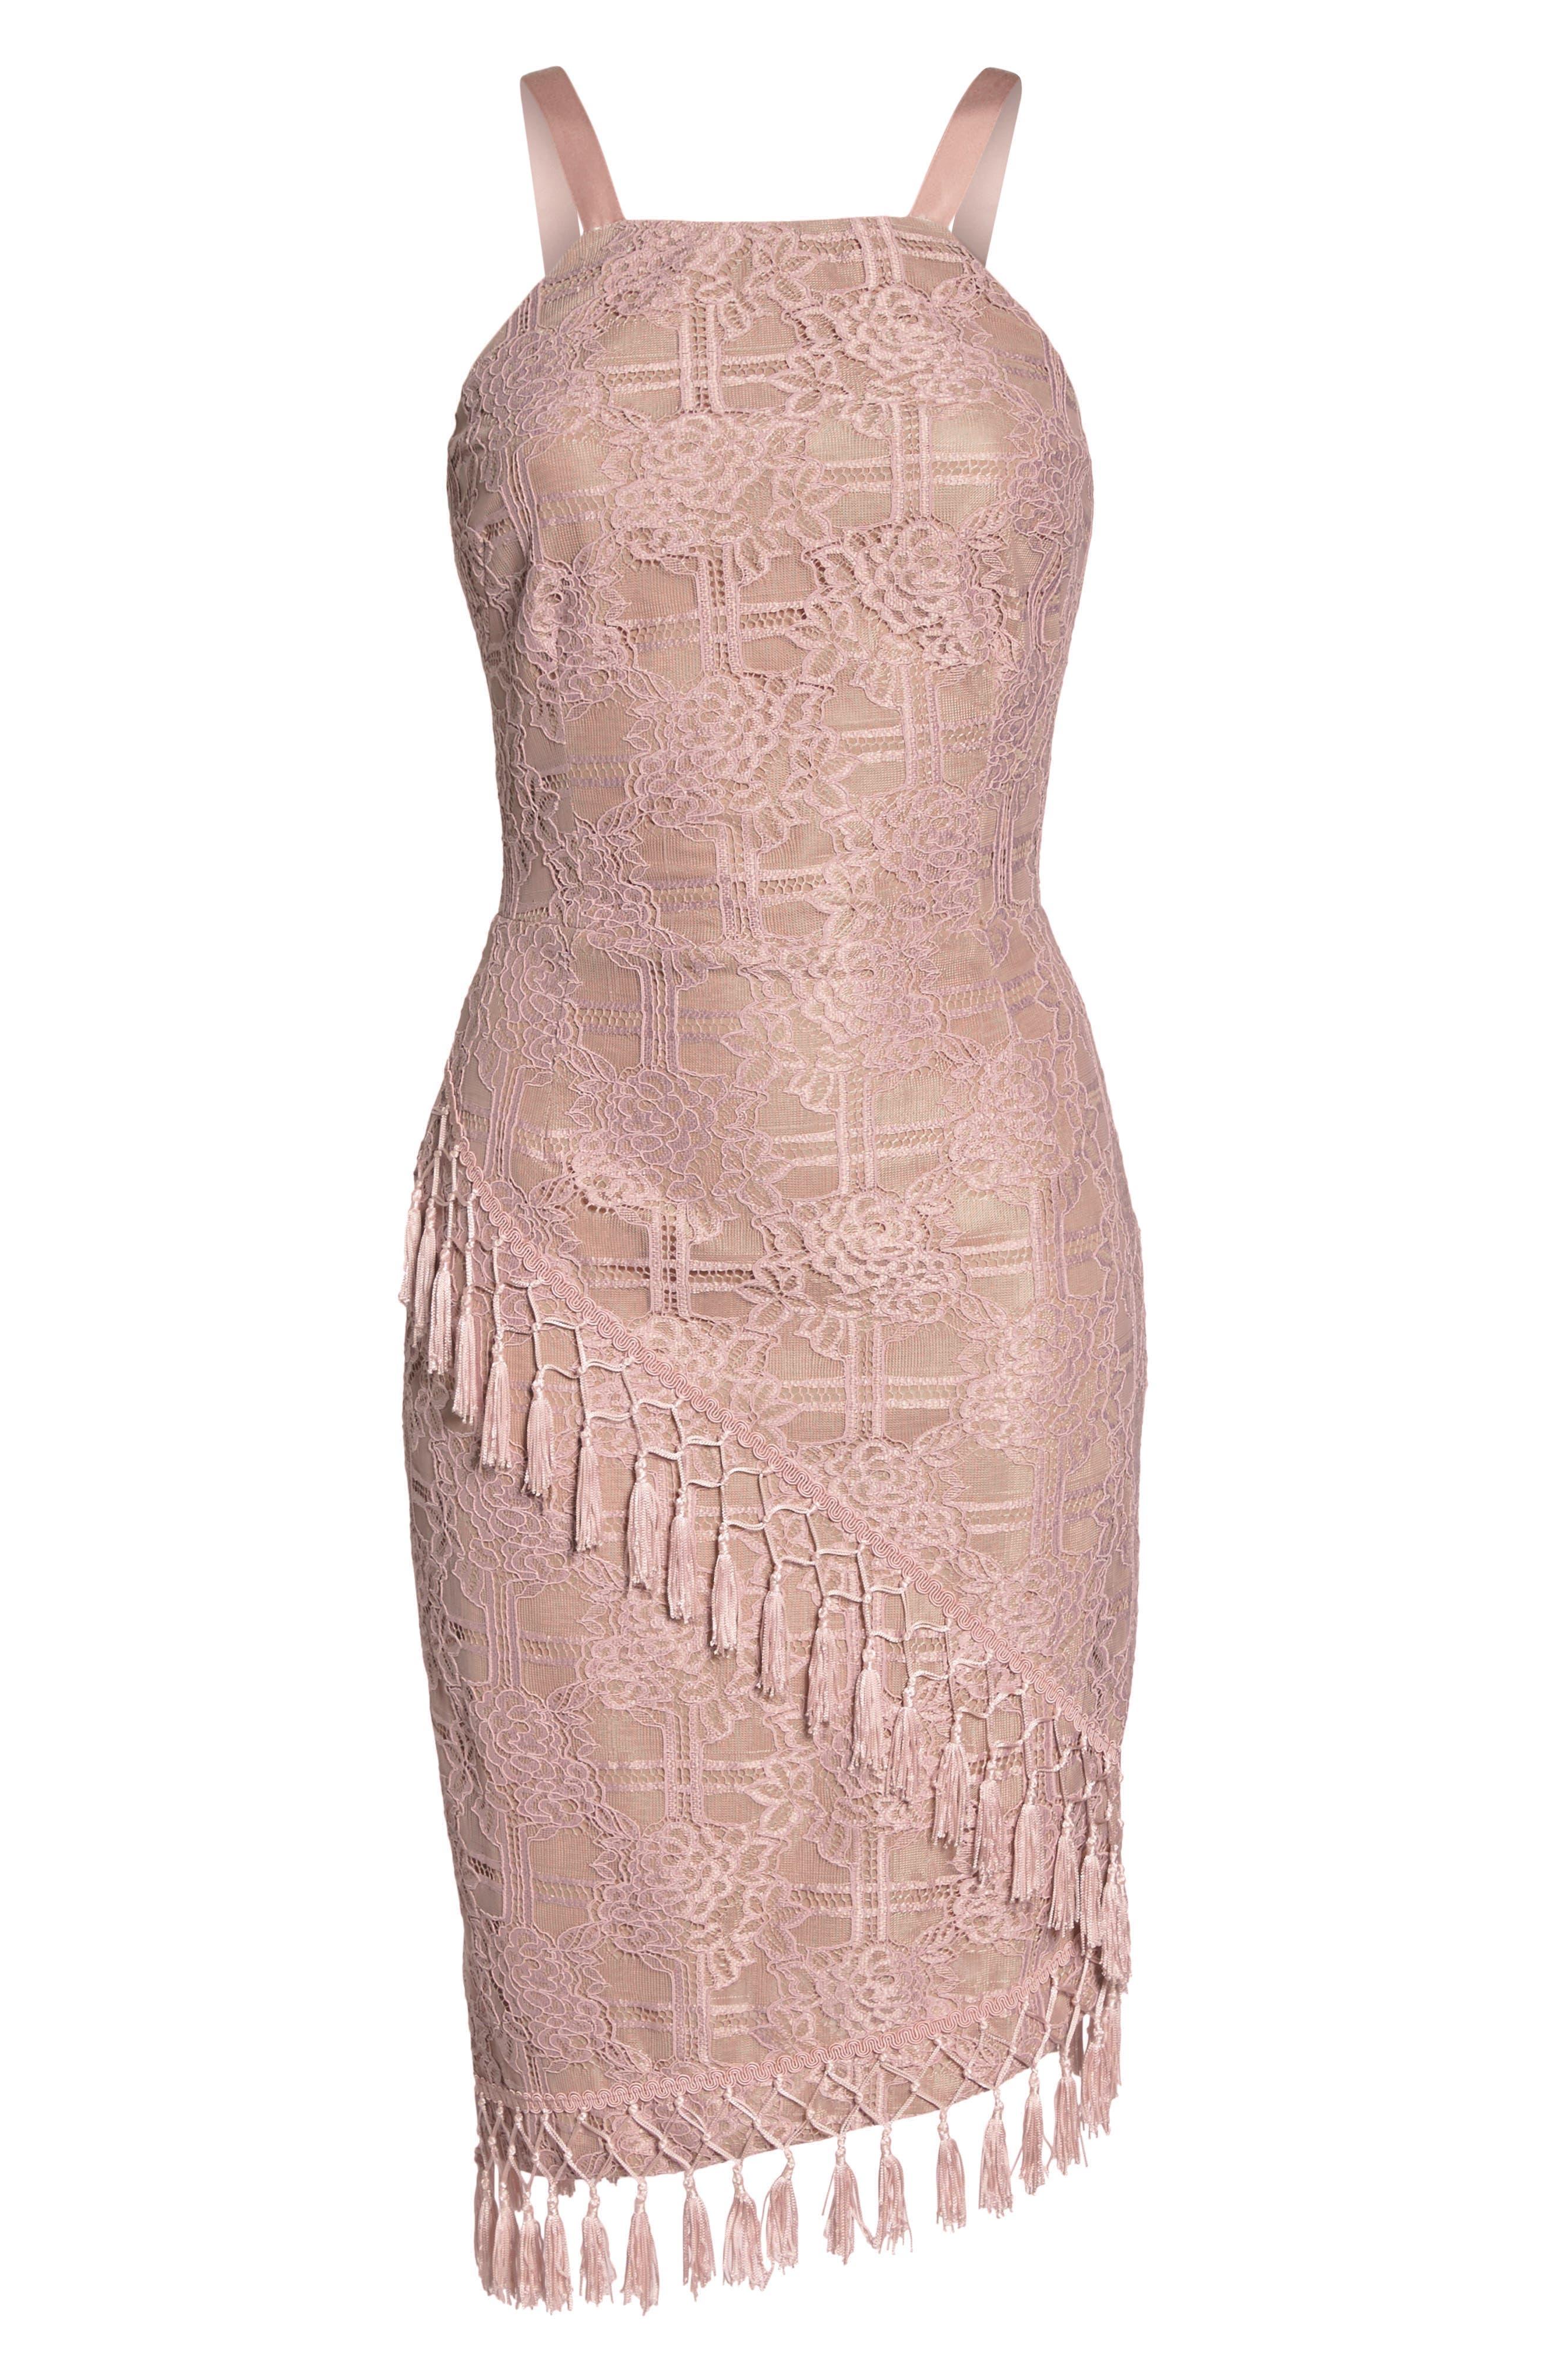 Natasha Asymmetrical Lace Dress,                             Alternate thumbnail 7, color,                             250